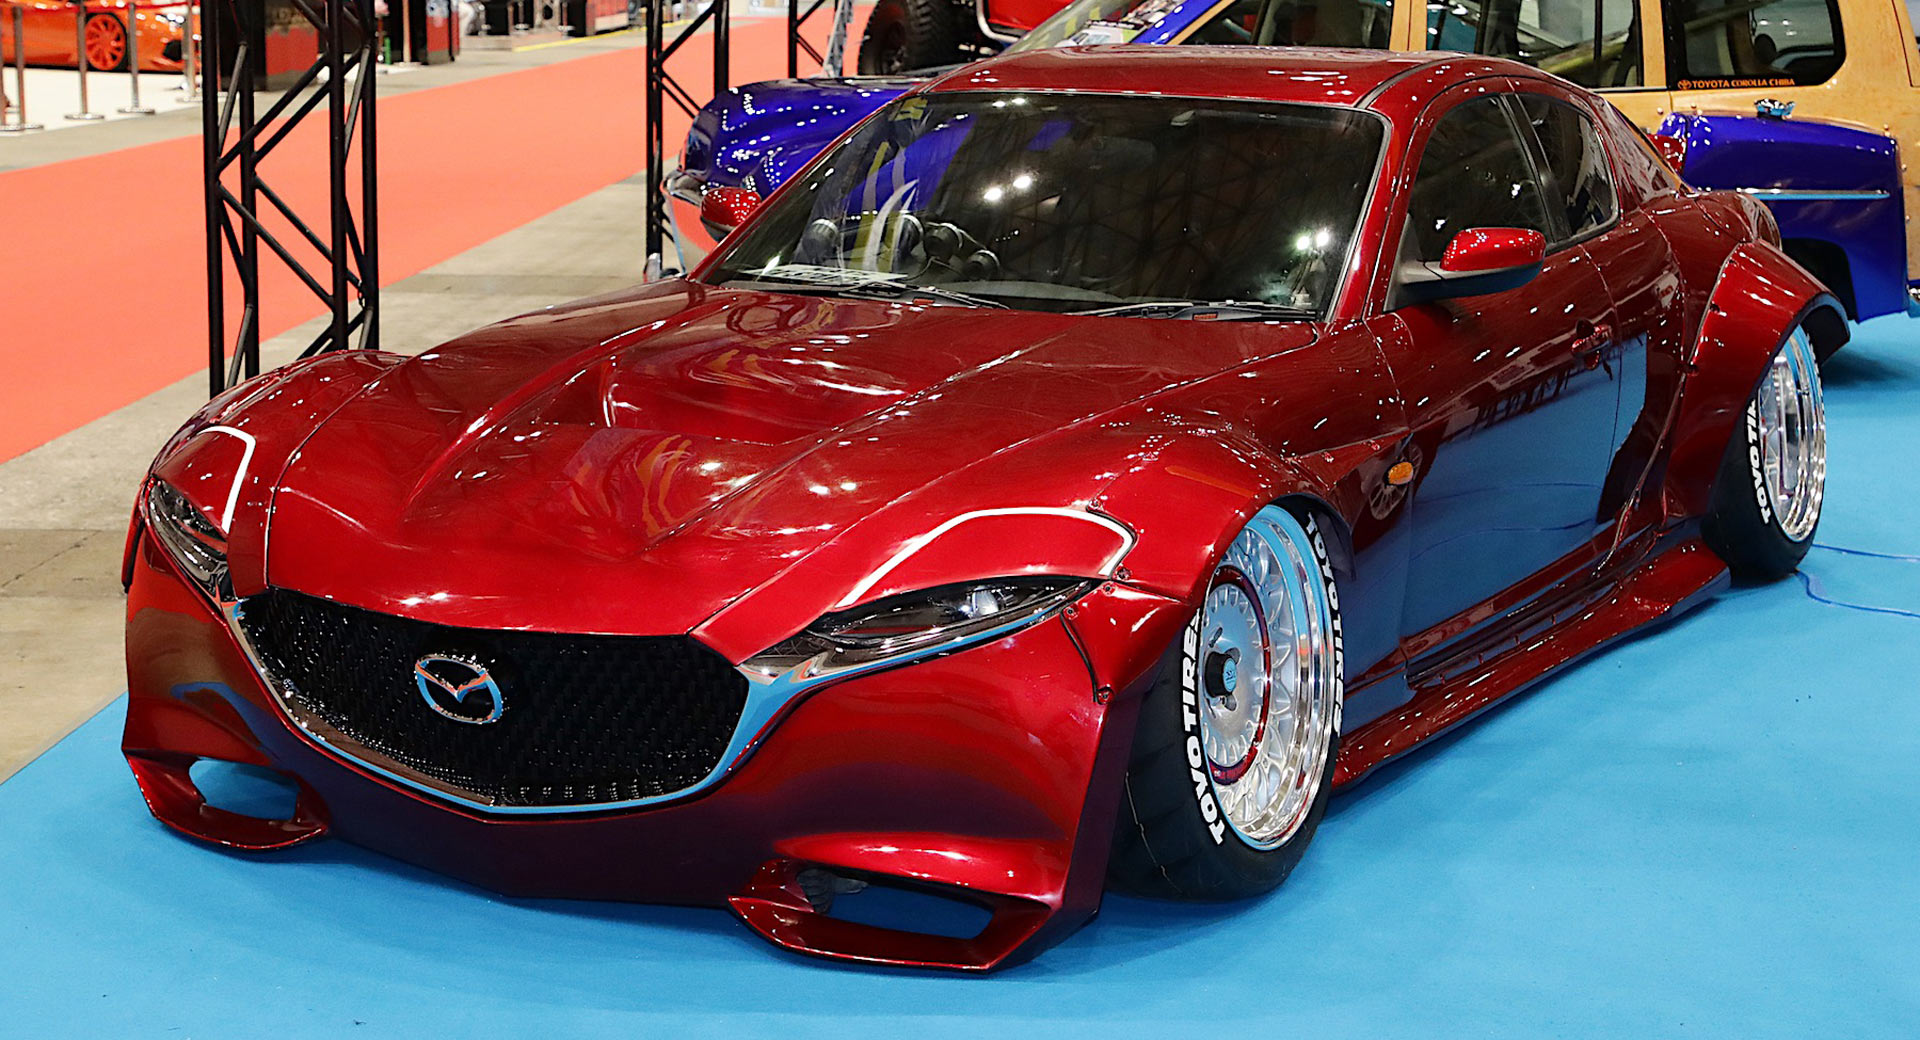 Kelebihan Kekurangan Mazda Rx Review